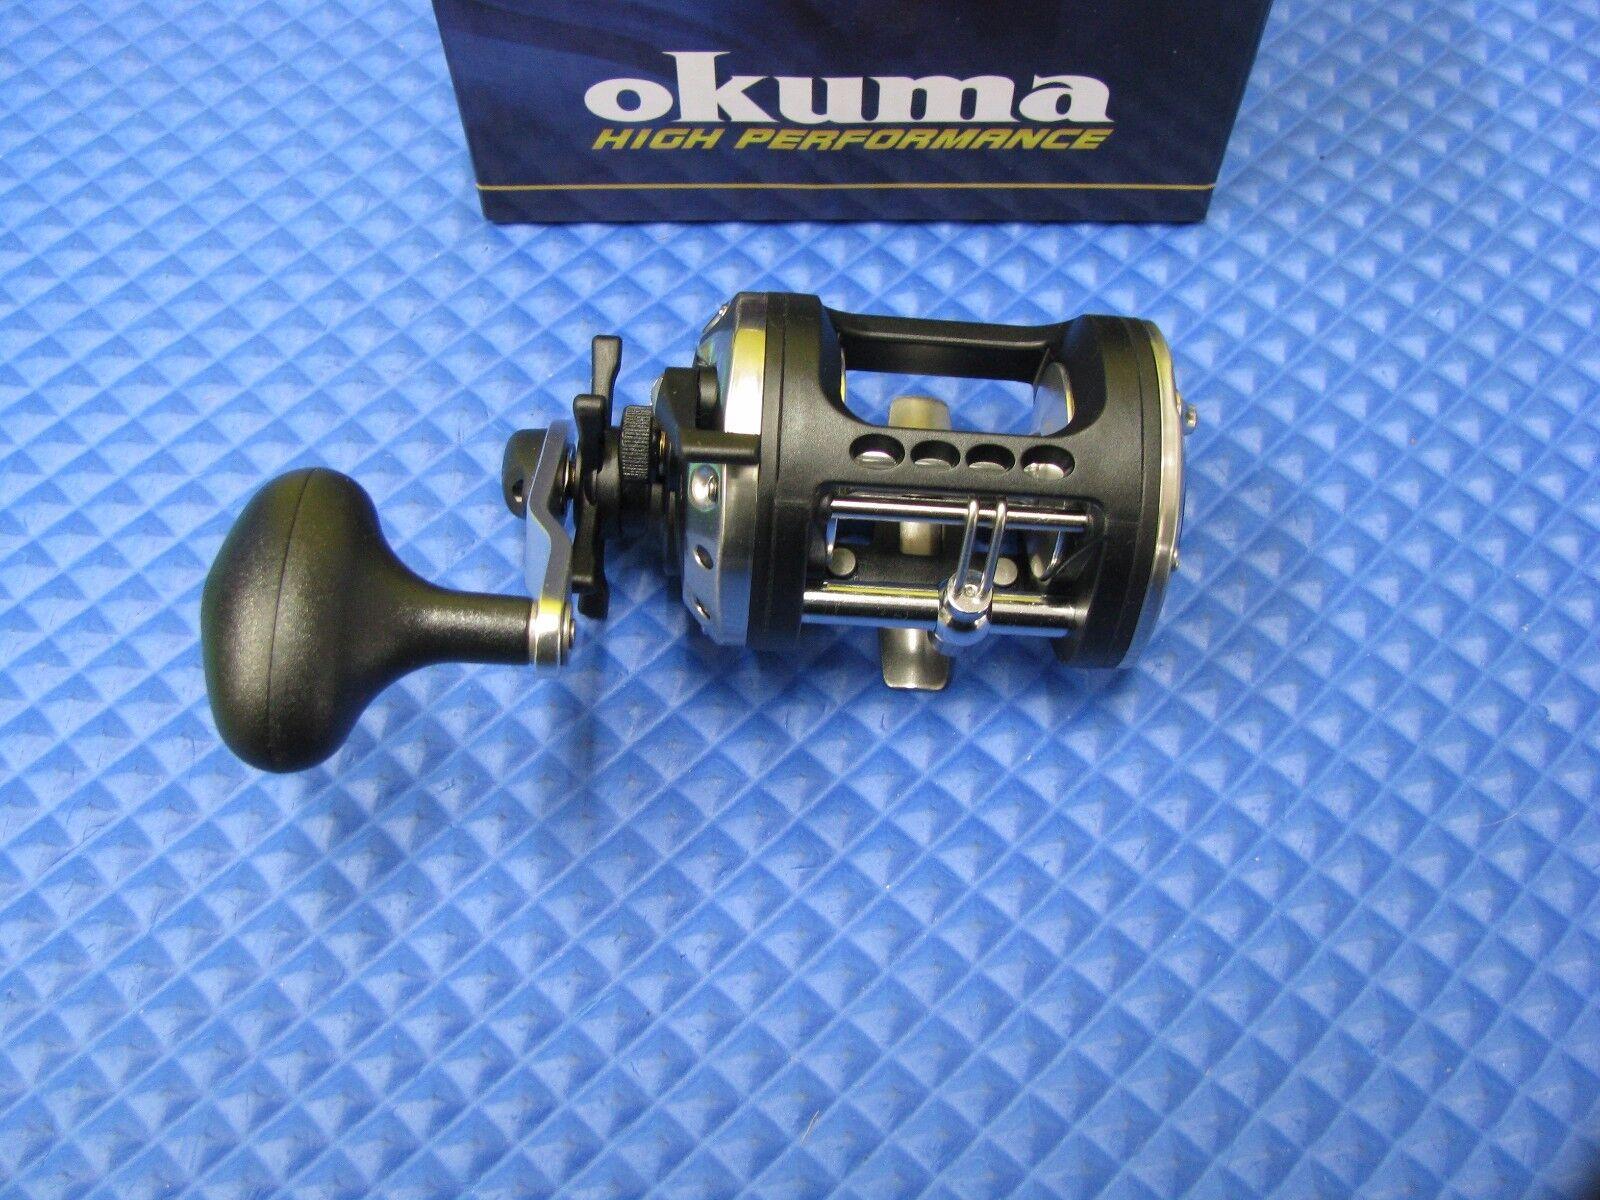 OKUMA PRO HP CLASSIC PRO OKUMA XP LEVELWIND TROLLING REEL 2 BRGS XP-202La 8a369c